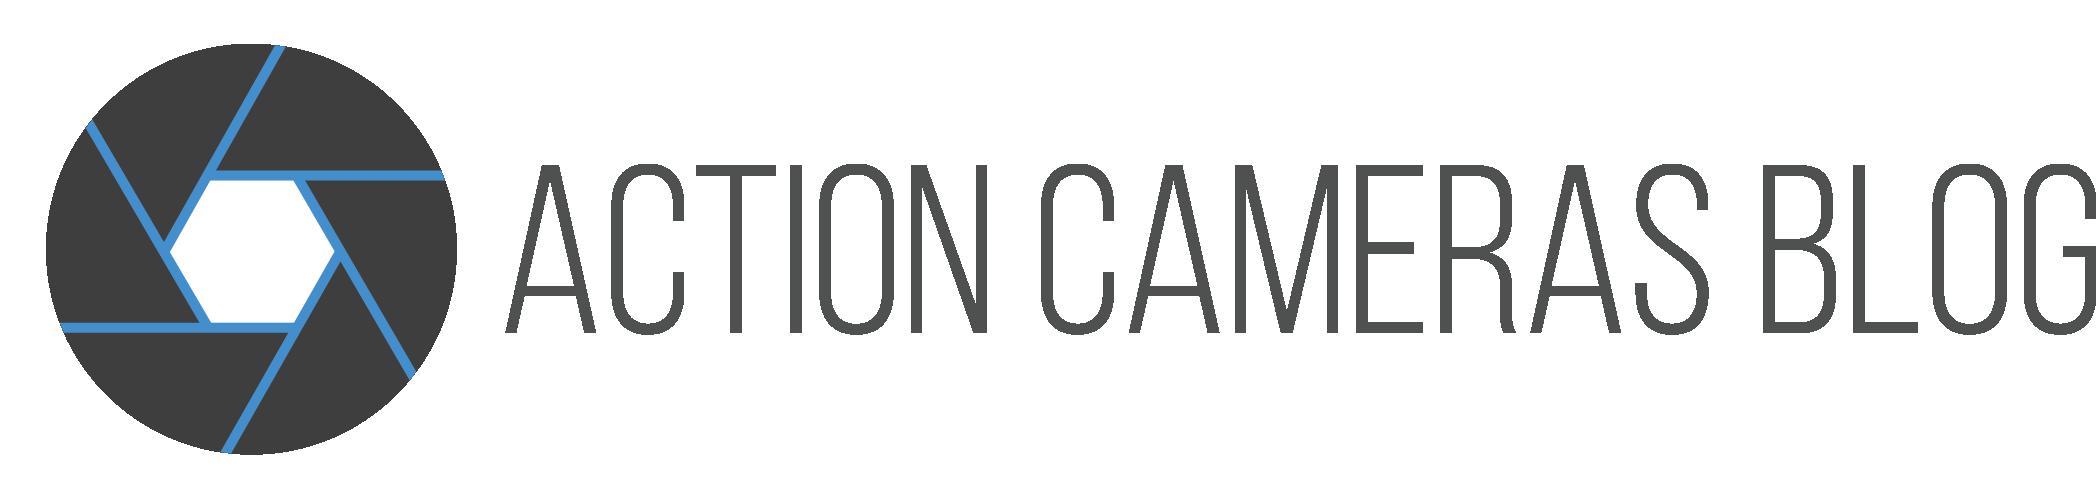 Action Cameras Blog